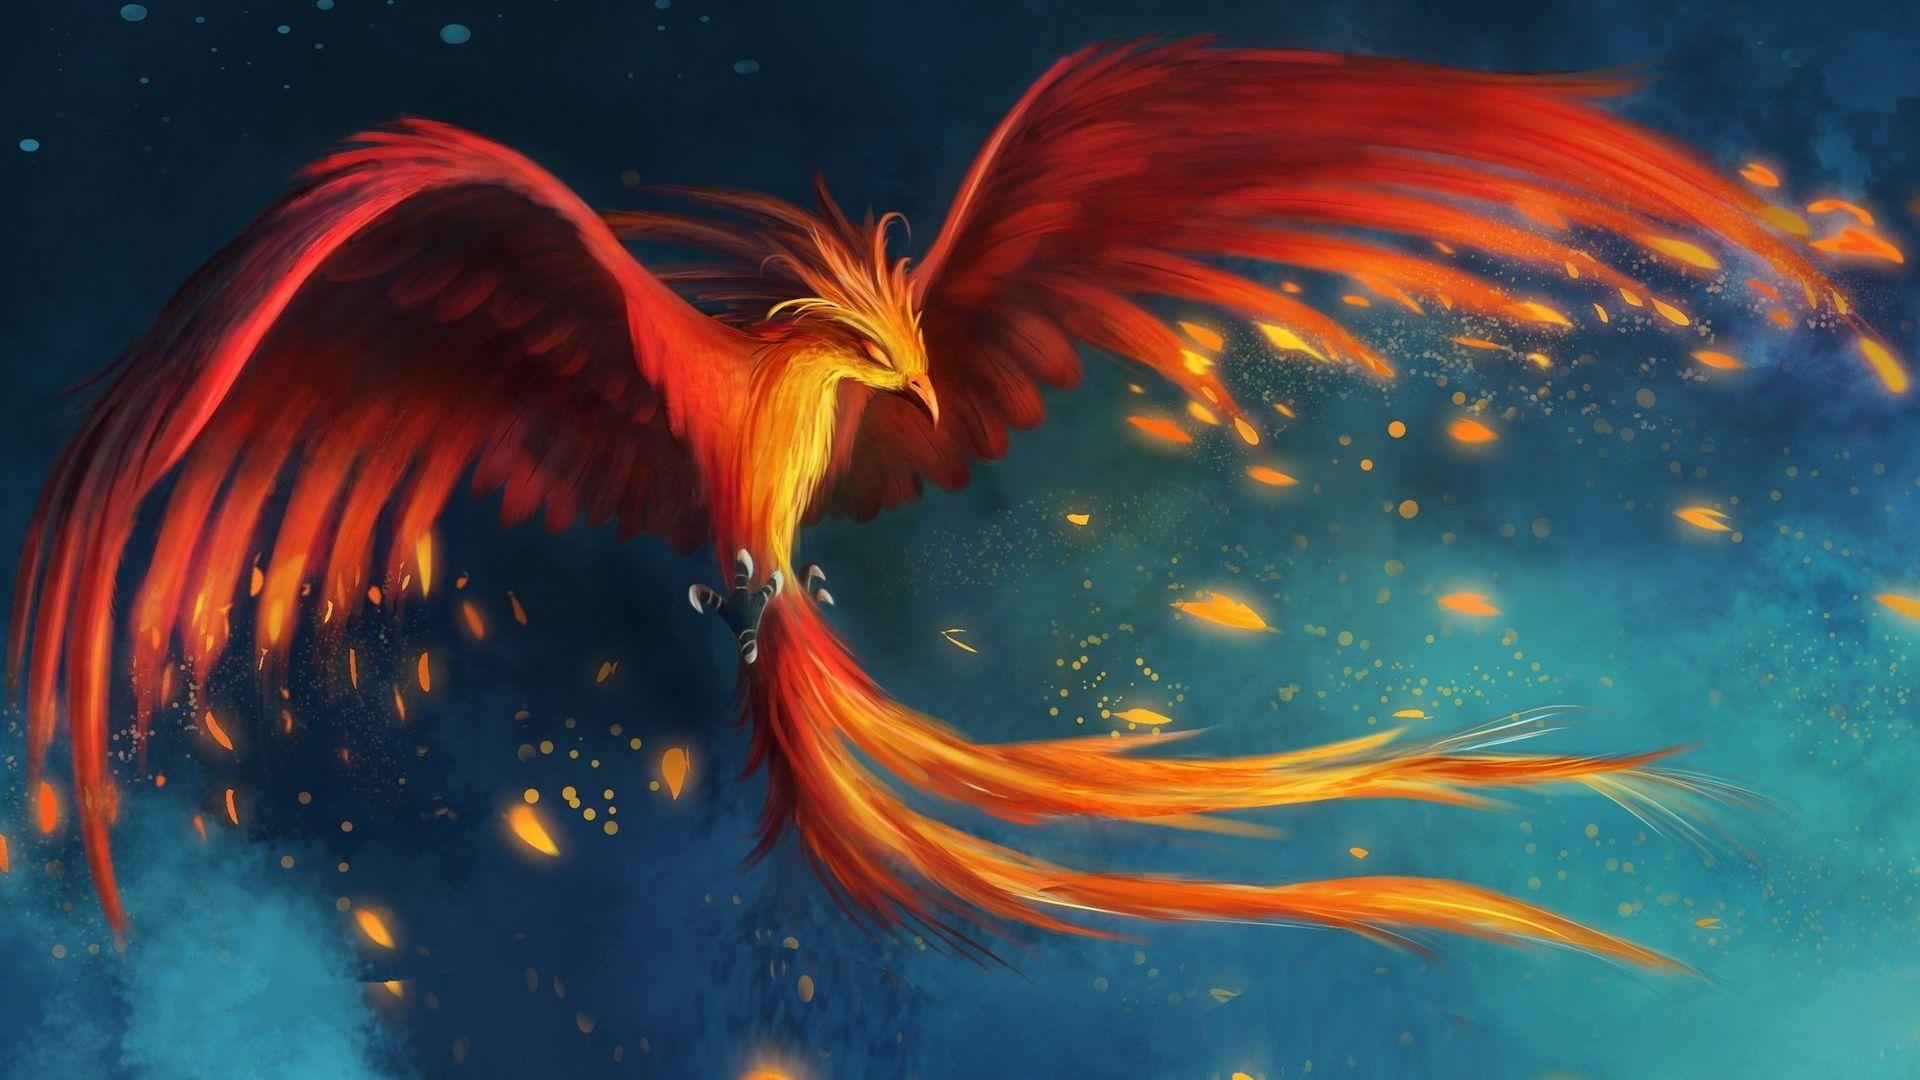 Fantasy Phoenix Wallpaper 5 Background Wallpaper 1920x1080